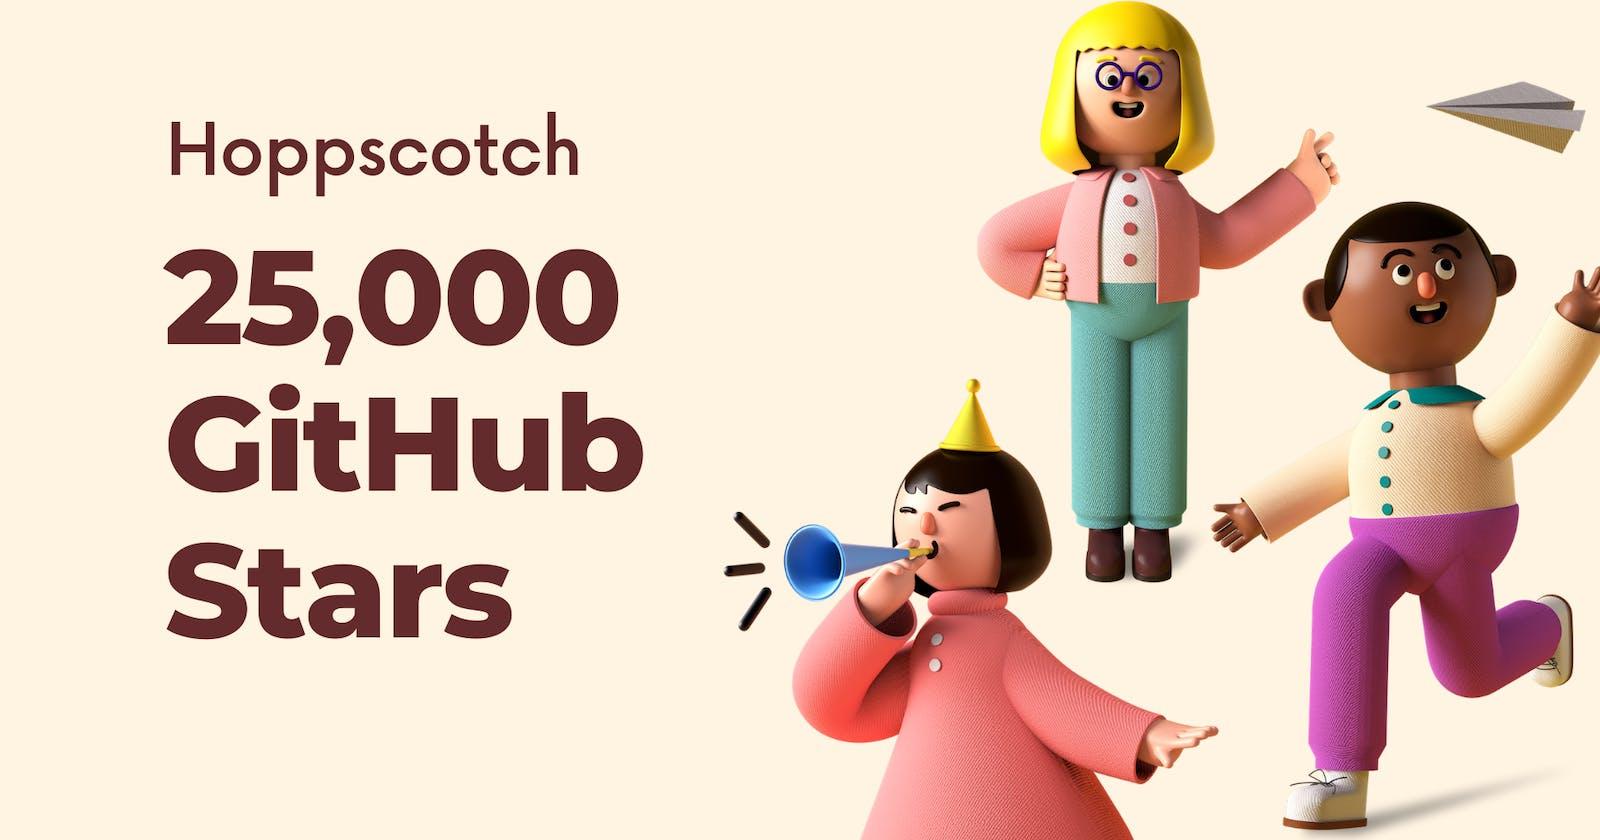 Hoppscotch Celebrating 25,000 GitHub Stars ✨